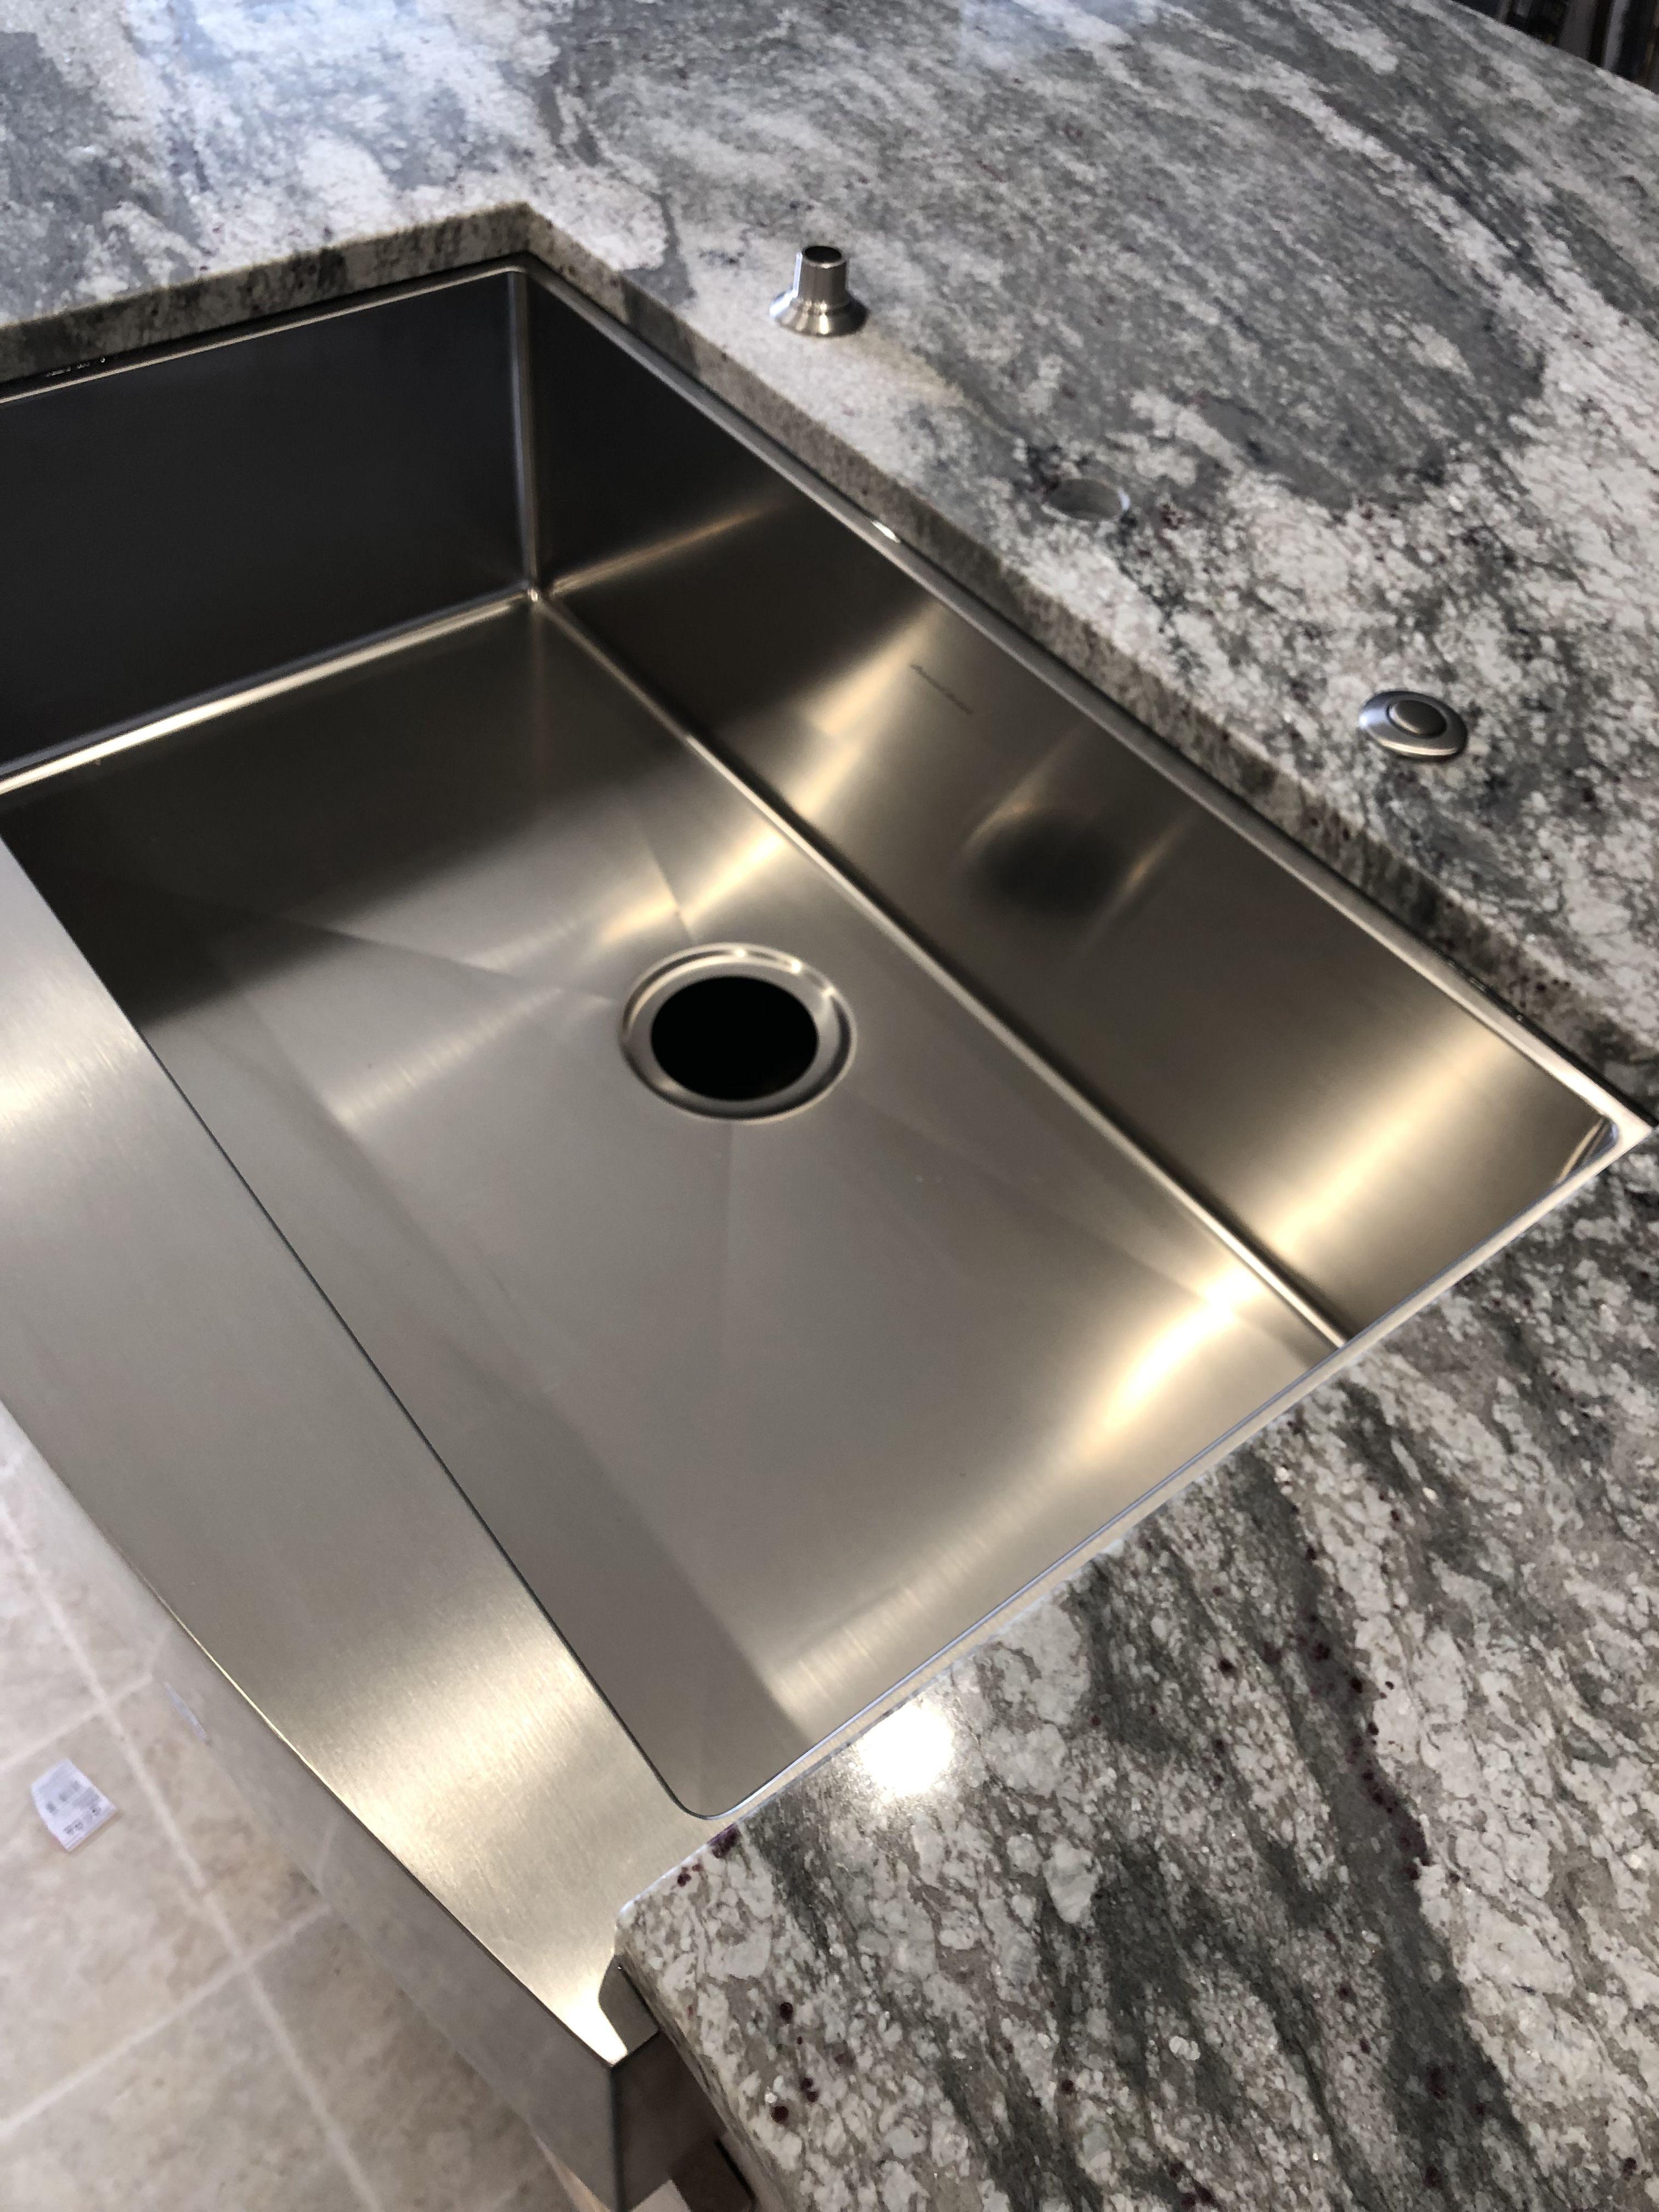 Farm House Sink Farmhouse Sink Kitchen Sinks Kitchen Stainless Undermount Kitchen Sinks